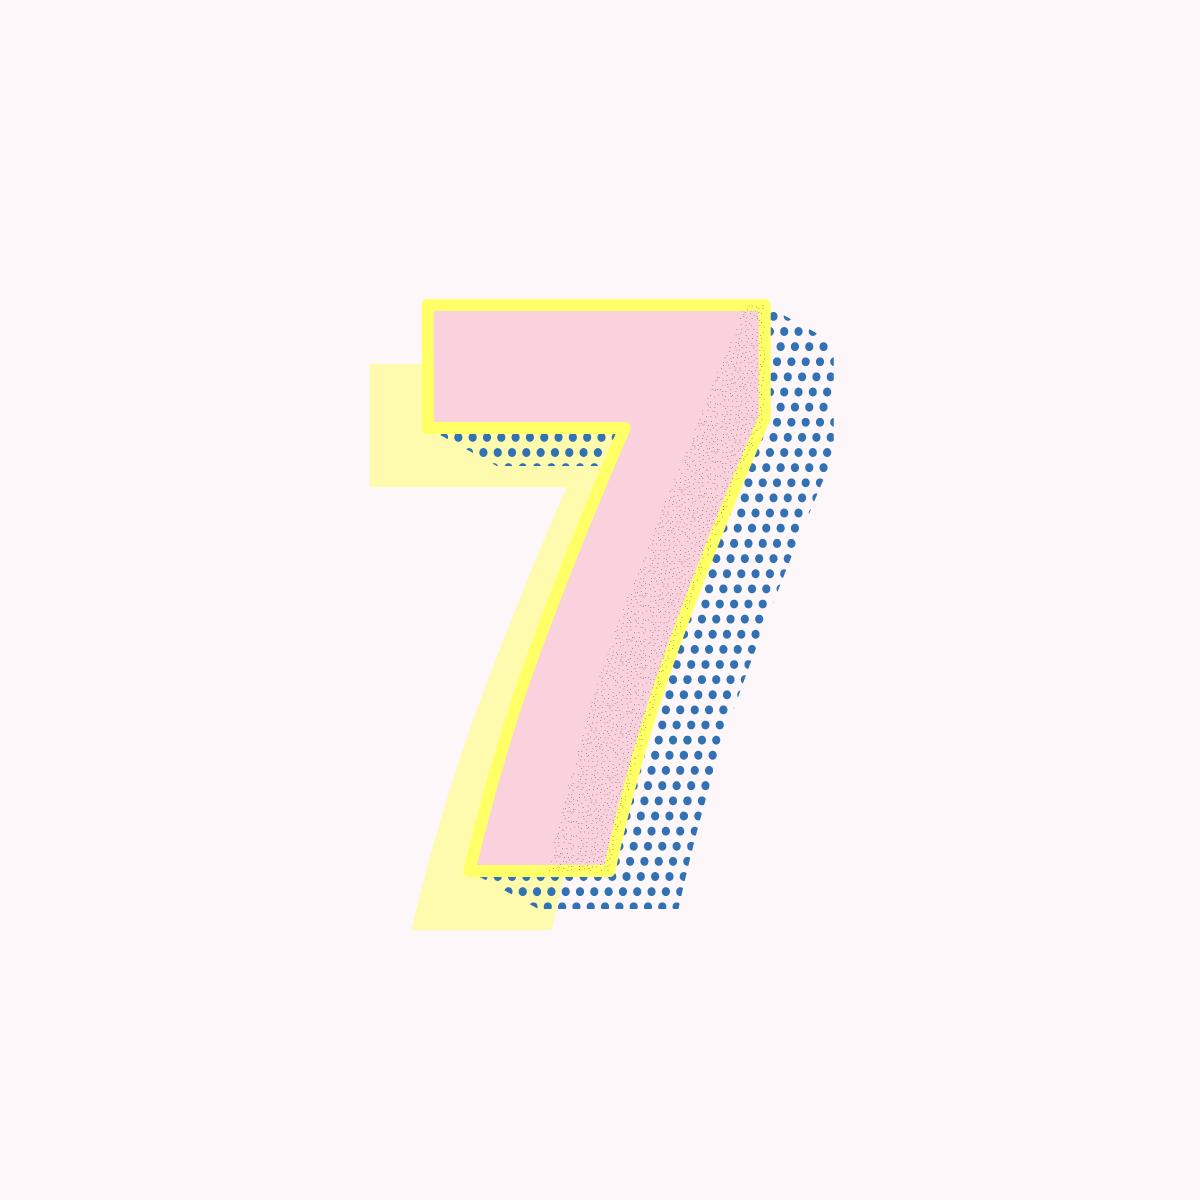 36days_7